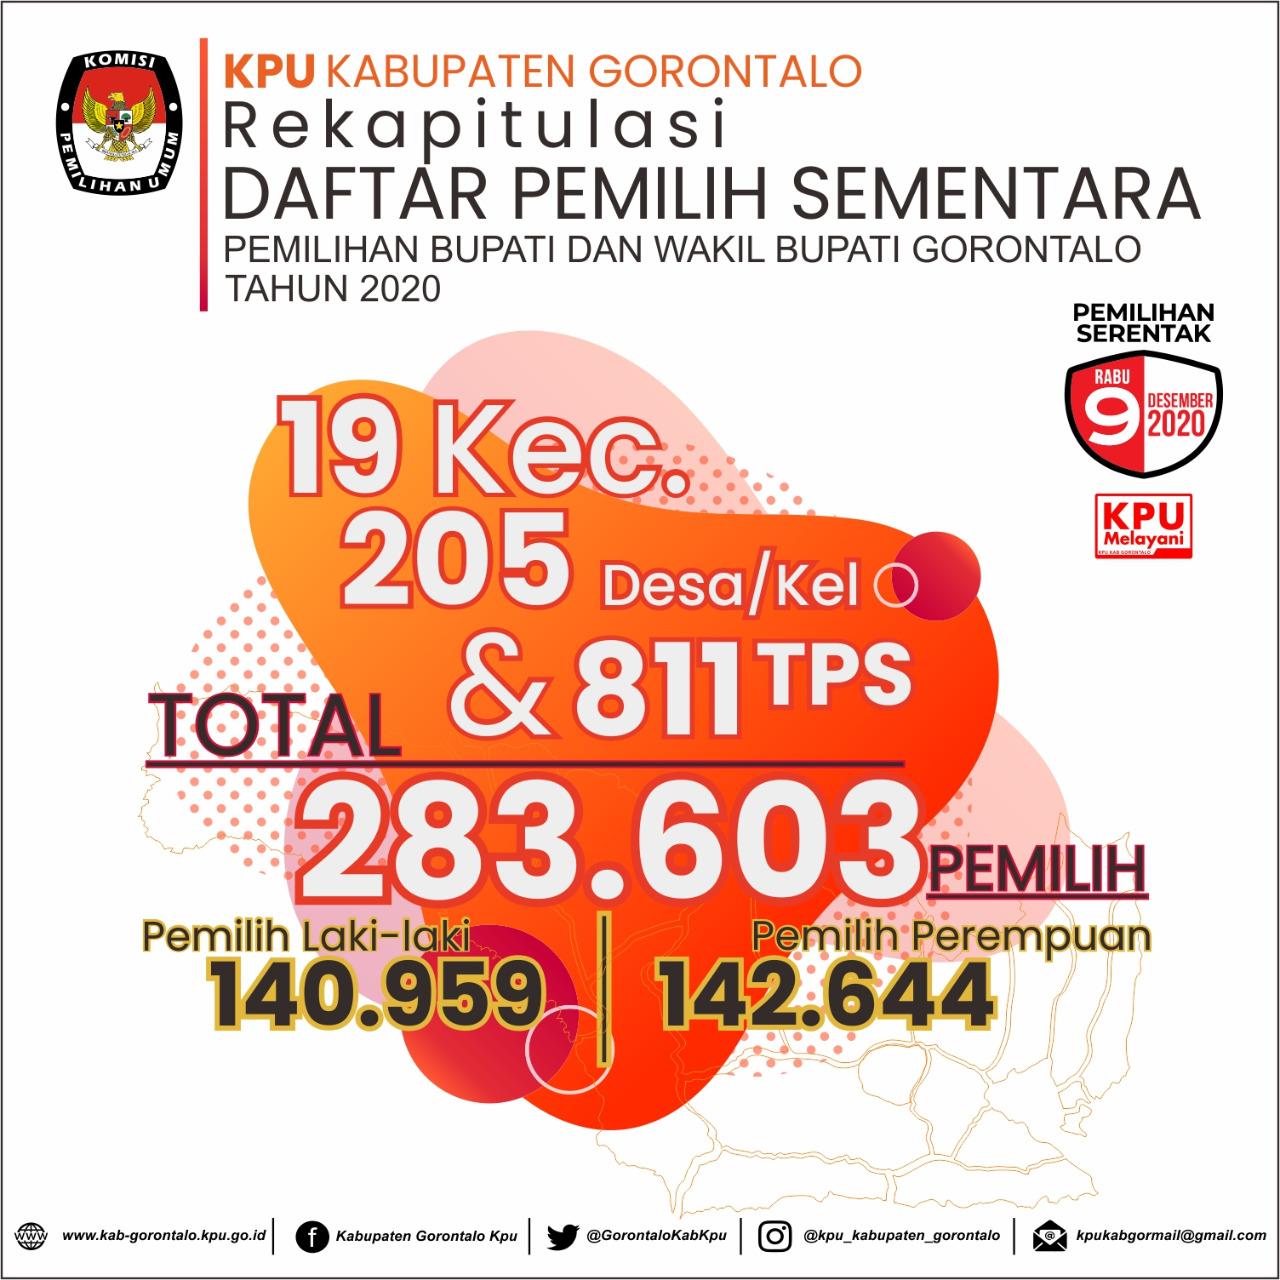 DPS Kab Gorontalo